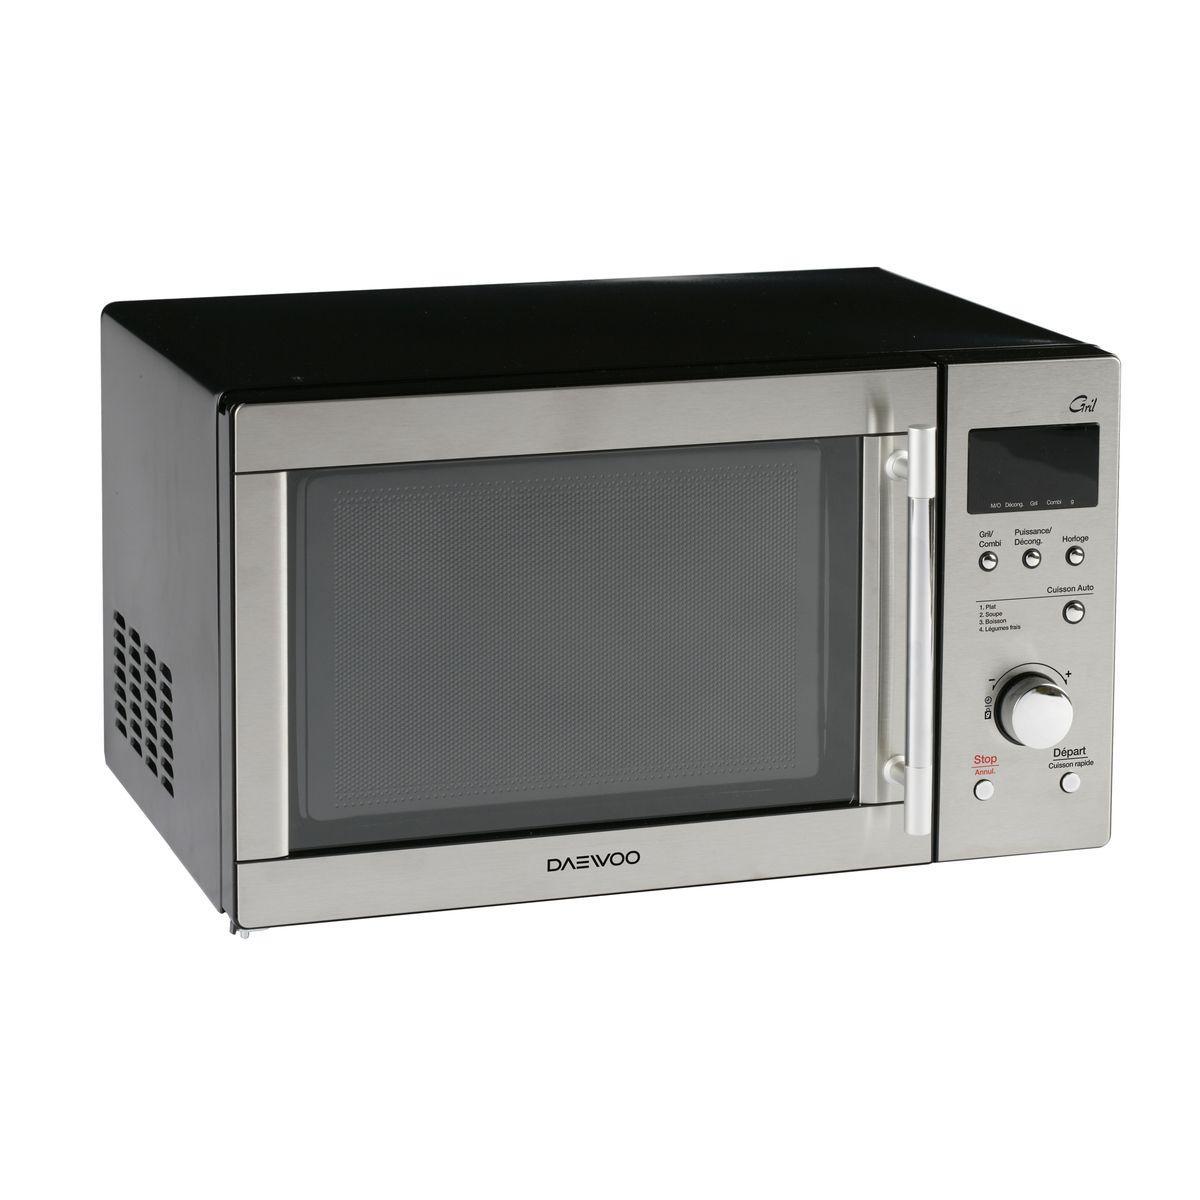 Four micro ondes grill KOG -9G7R - Inox